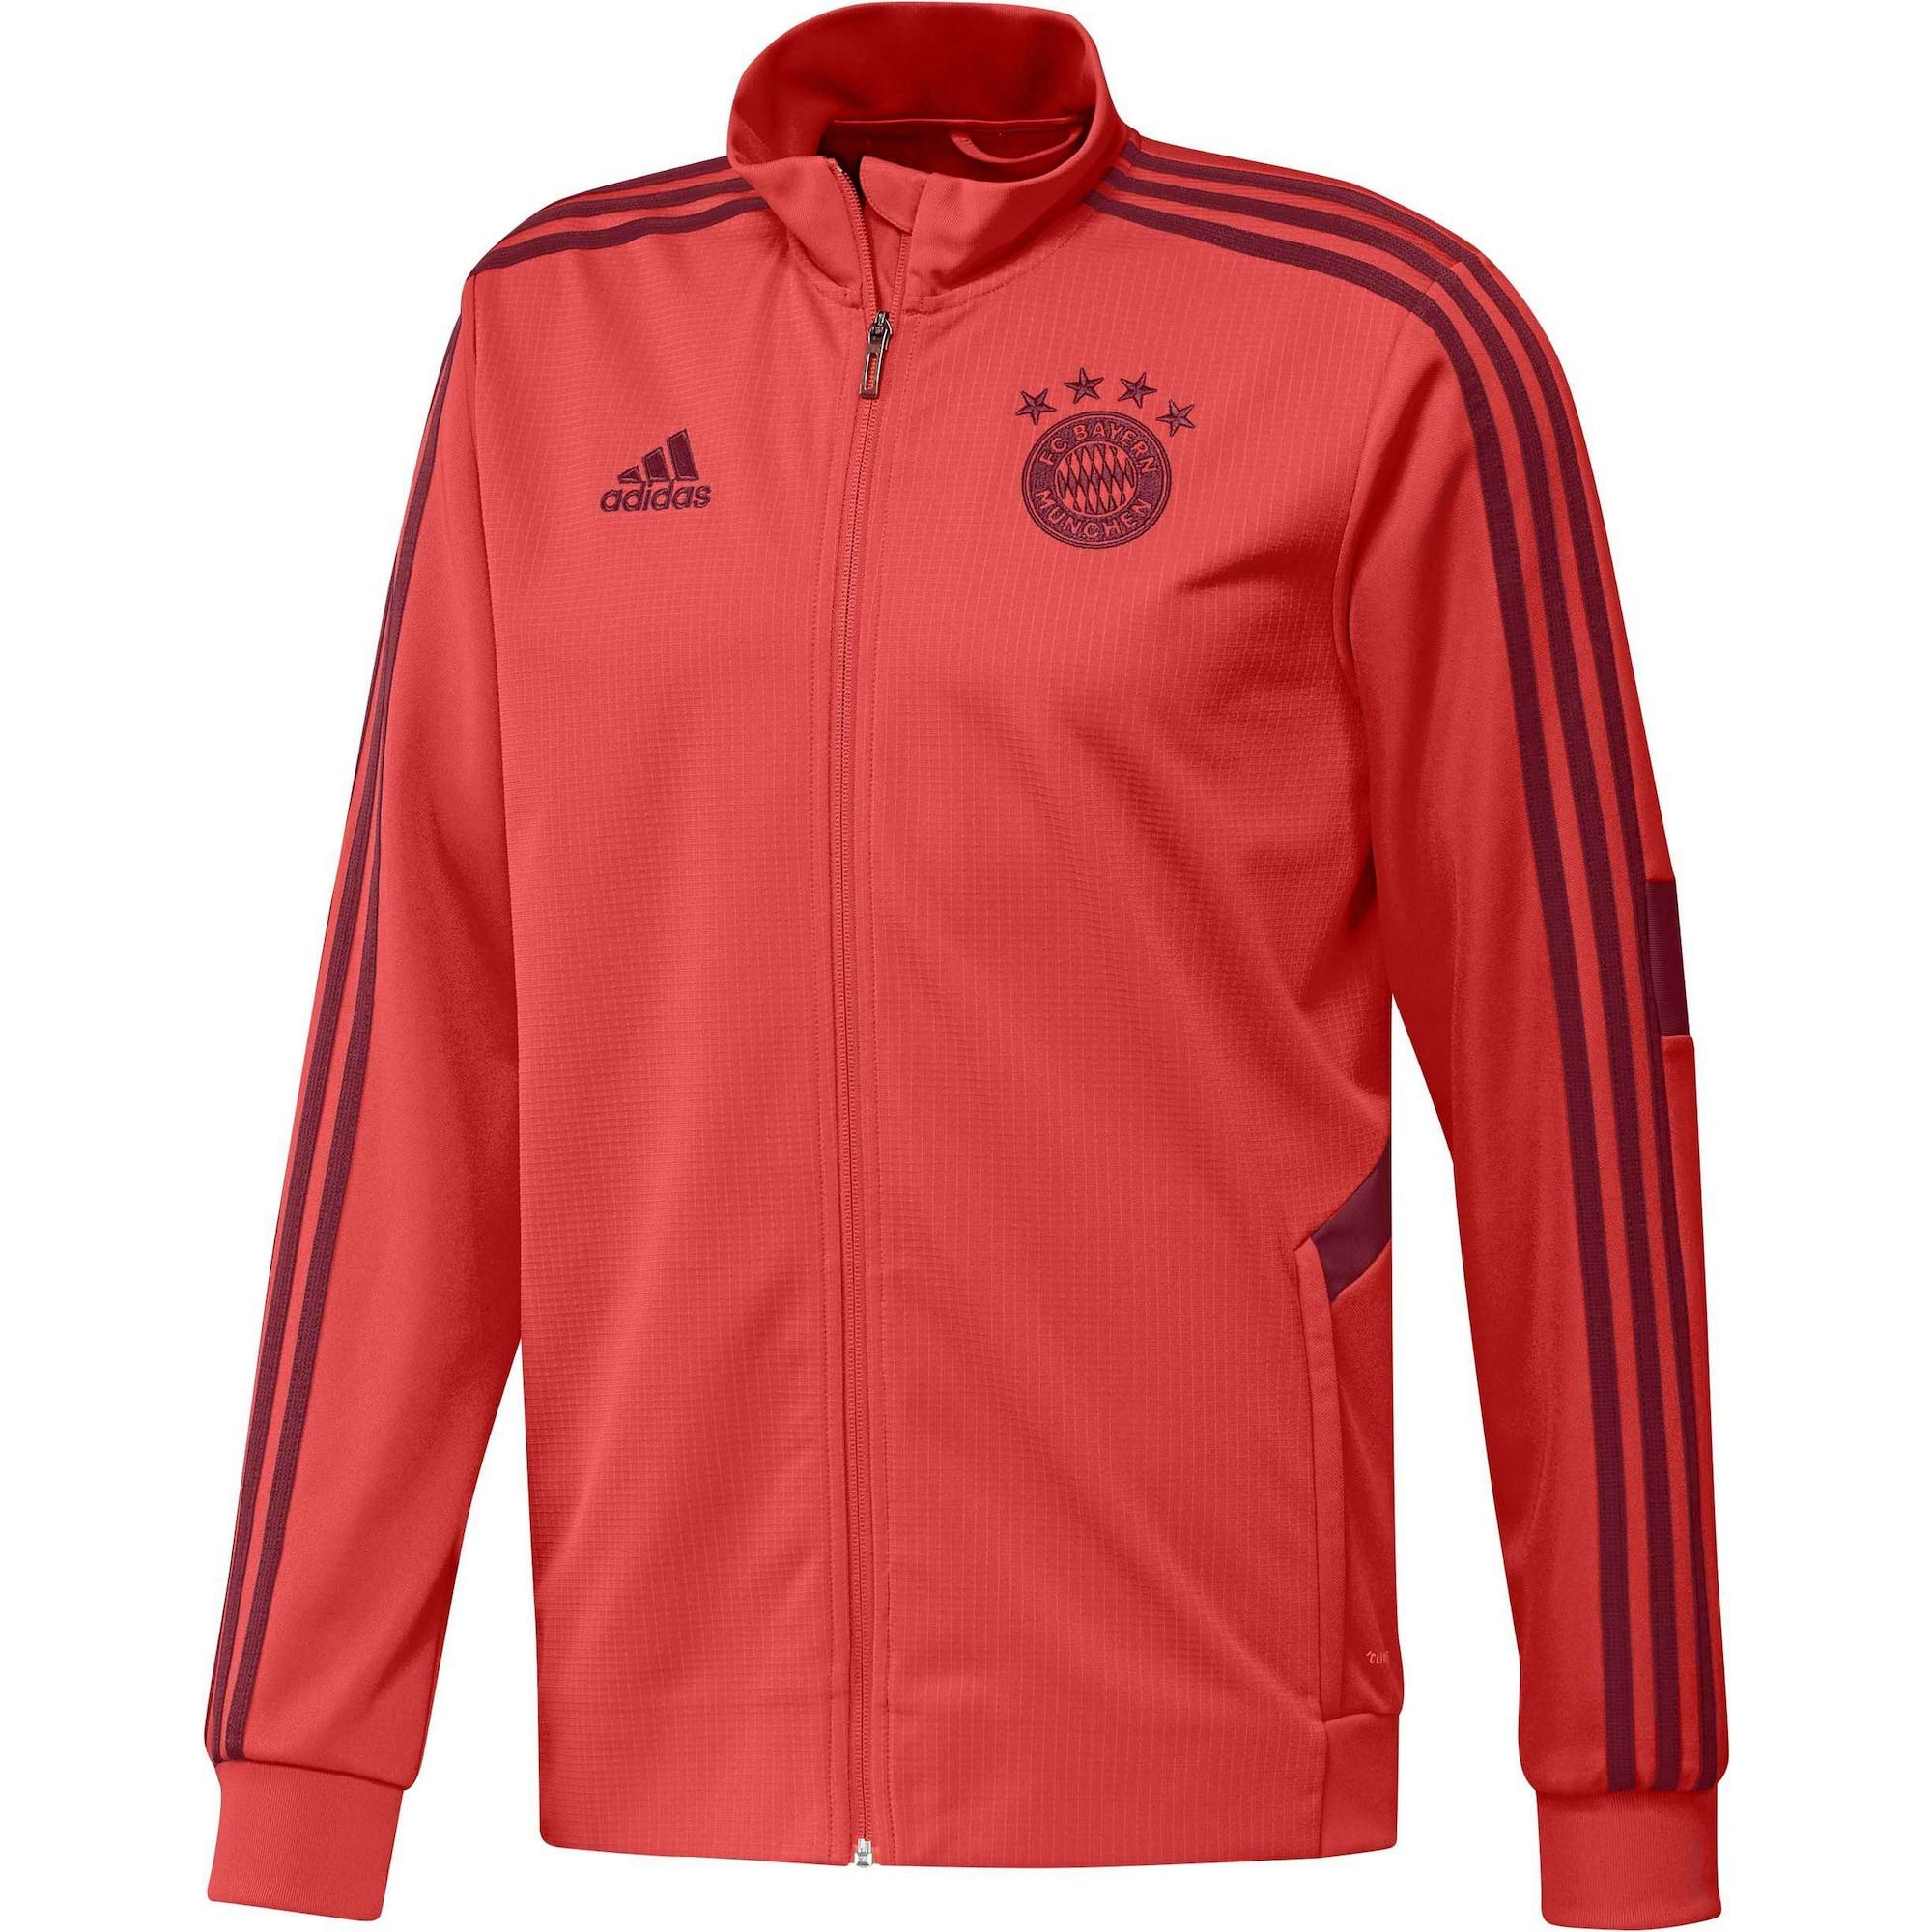 Trainingsjacke 'FC Bayern München' | Sportbekleidung > Sportjacken > Trainingsjacken | ADIDAS PERFORMANCE